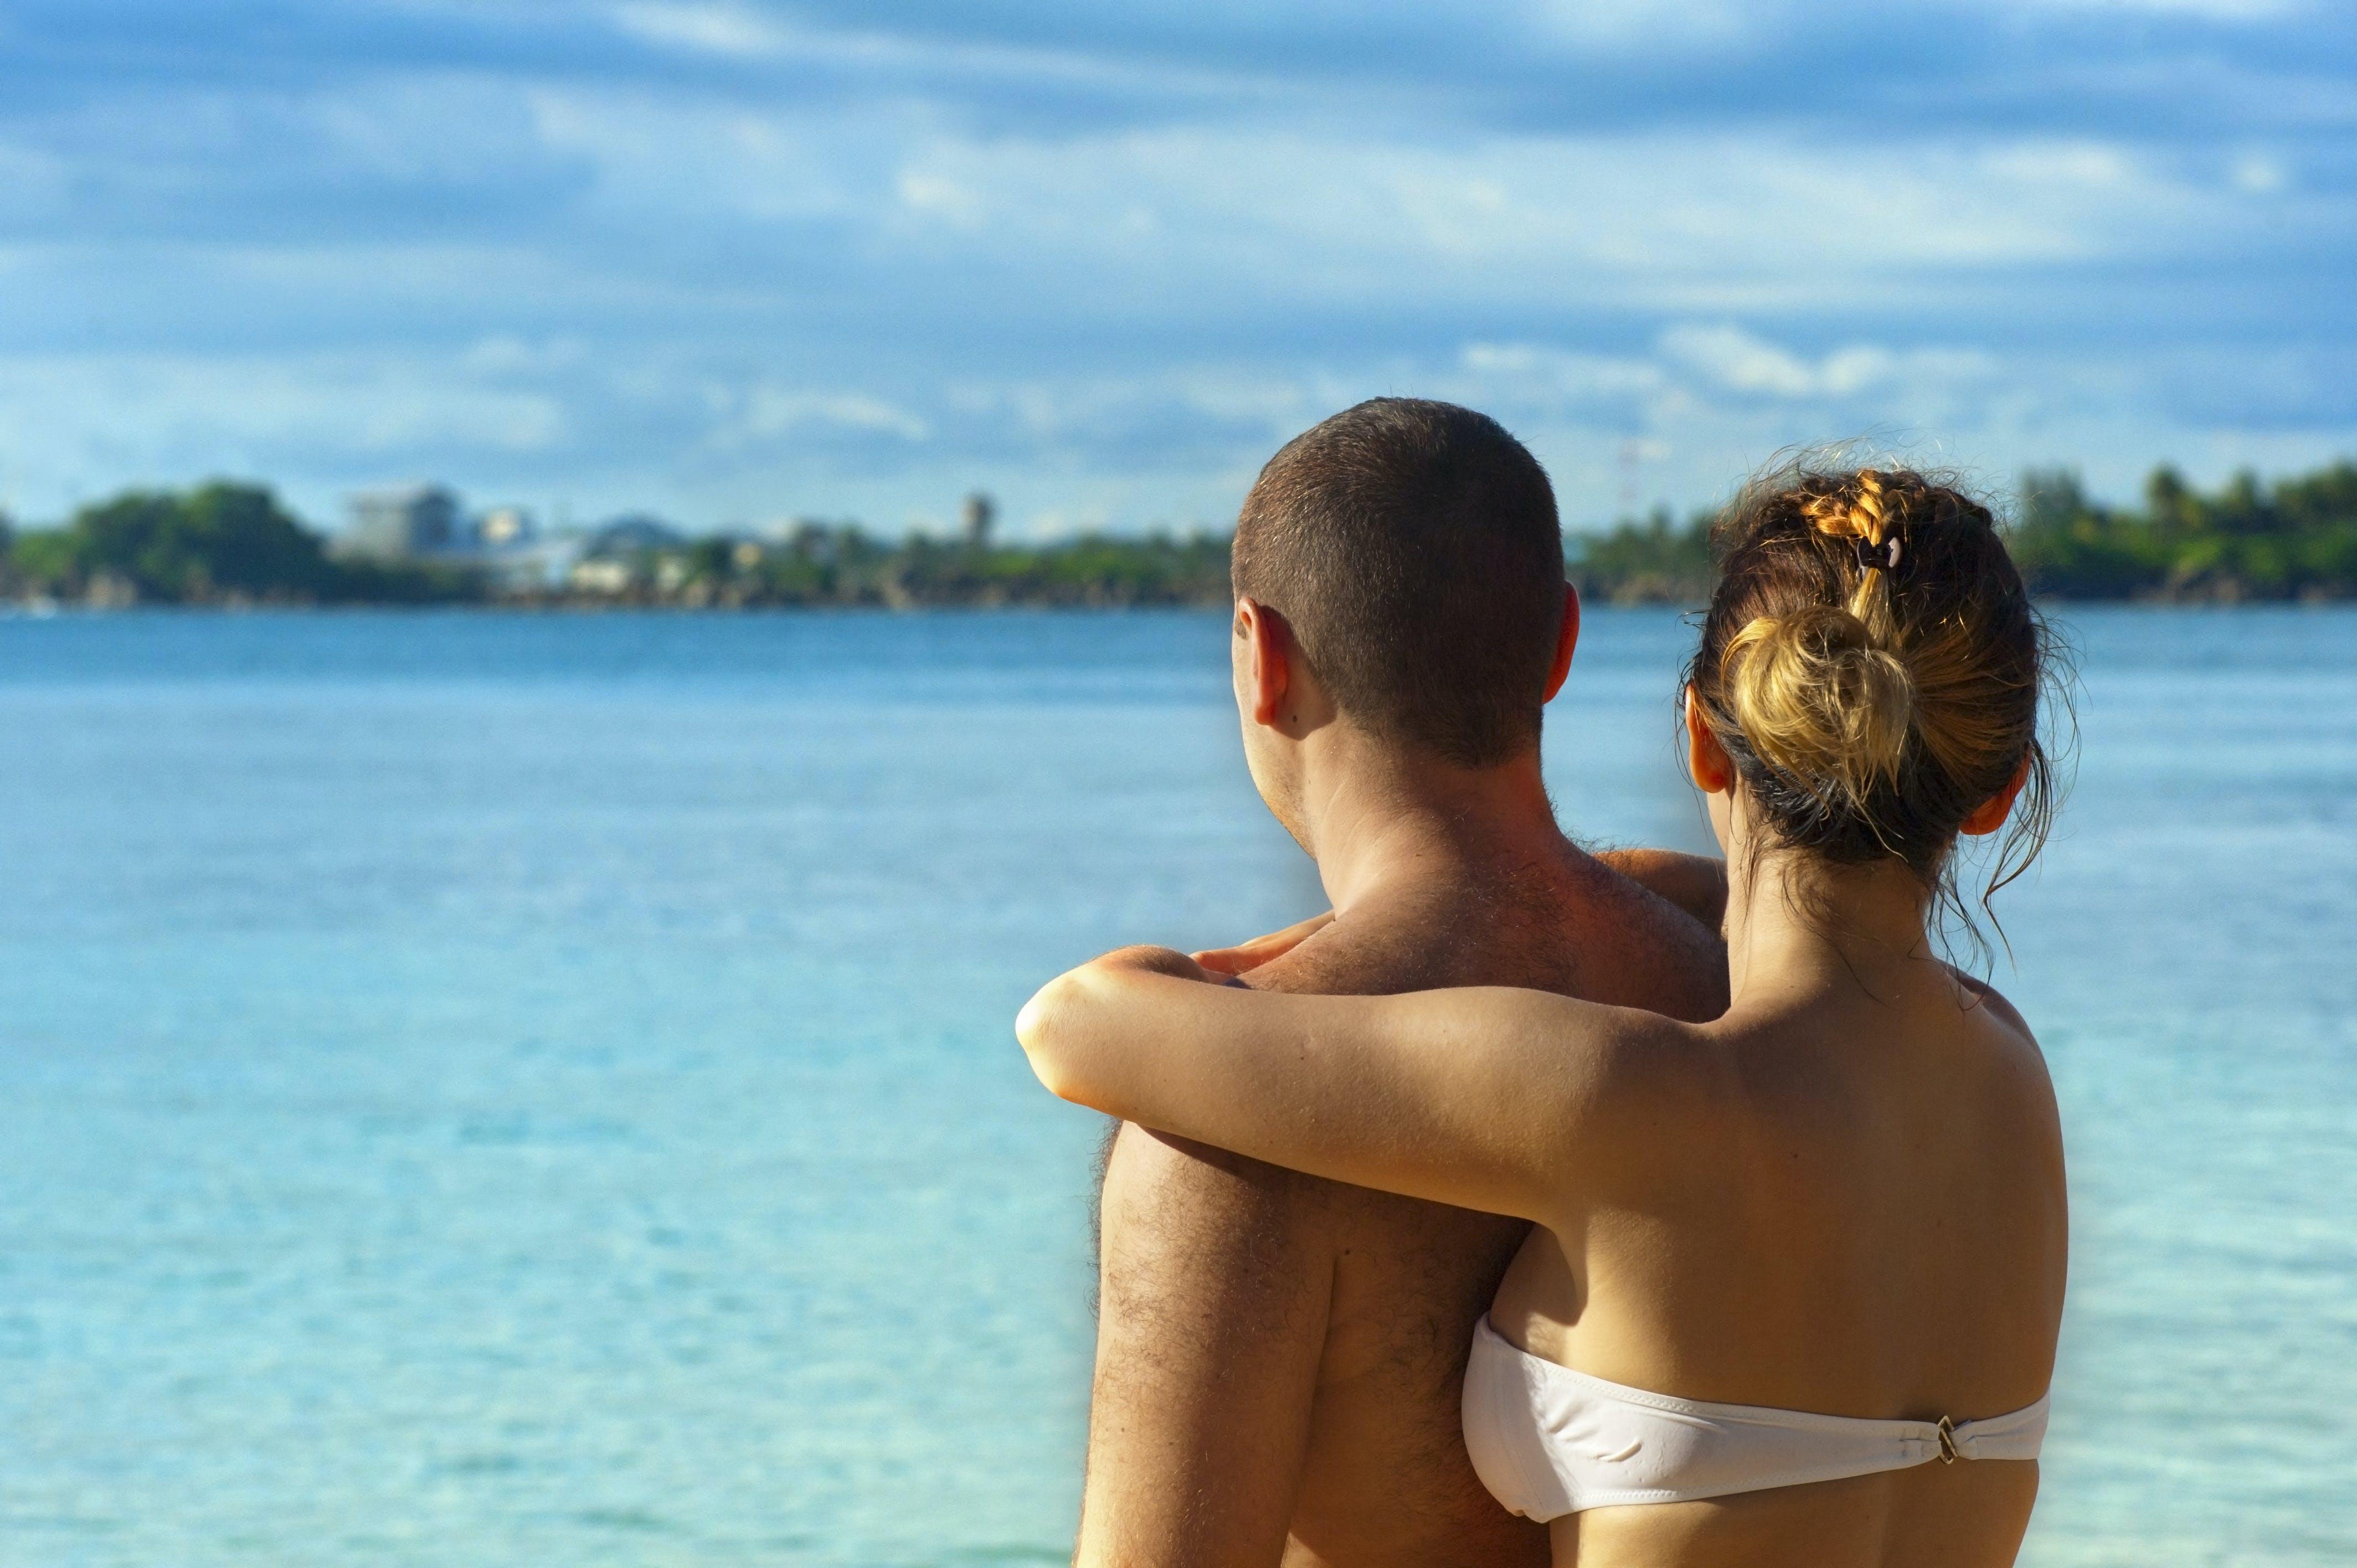 Woman Embracing Man Near Water